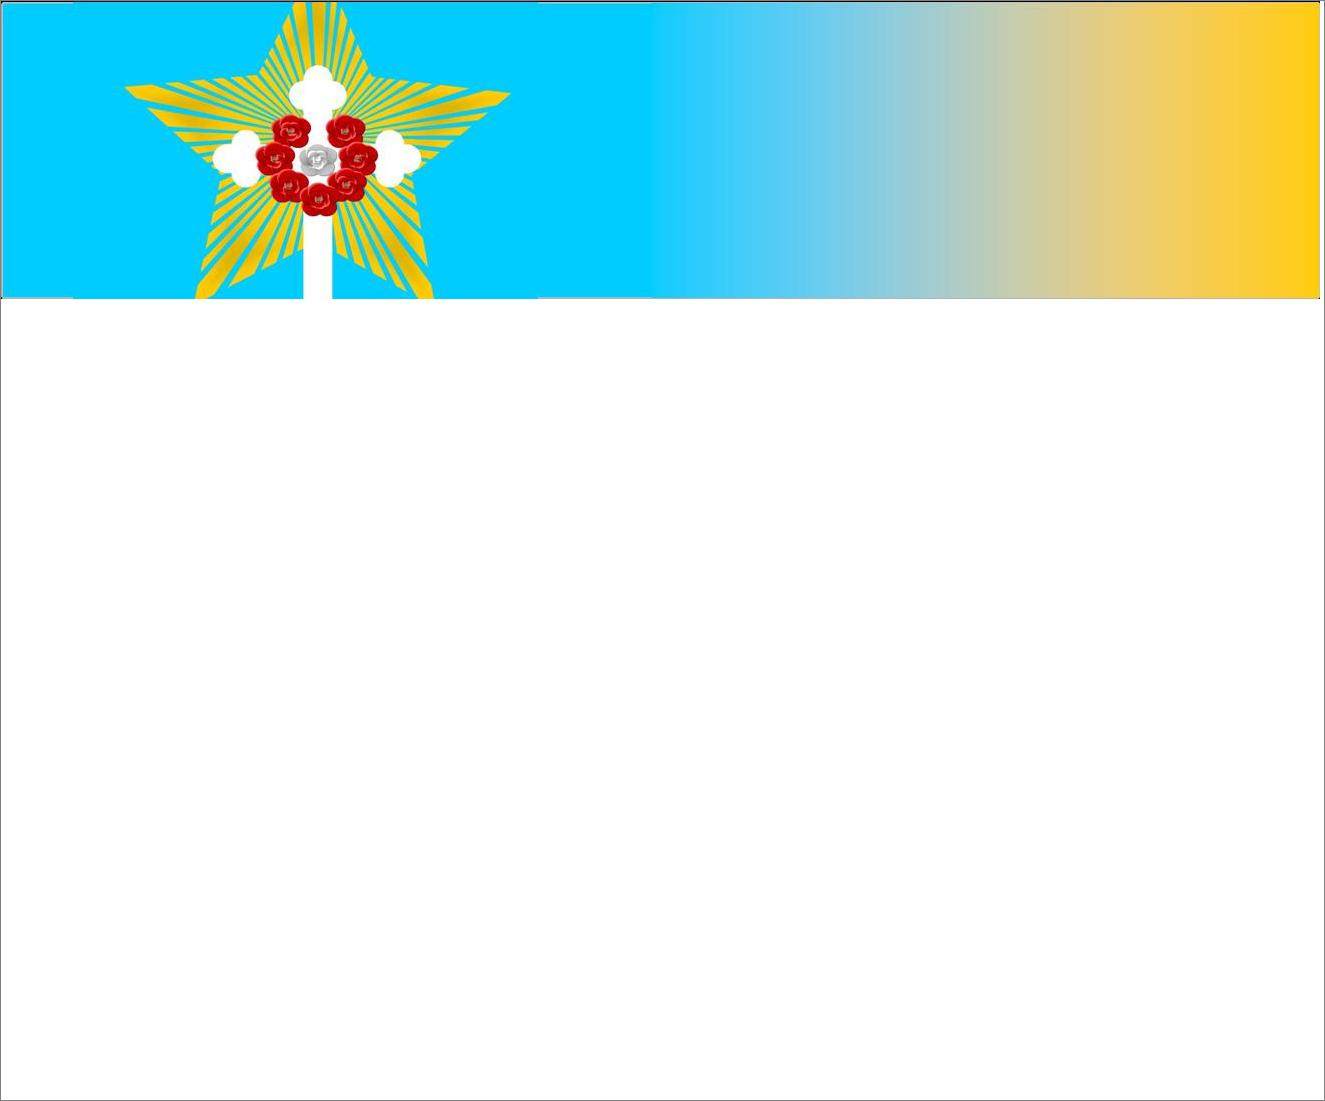 Calendario Tebaico.Autunno 2015 Benvenuti Su Rc Tube